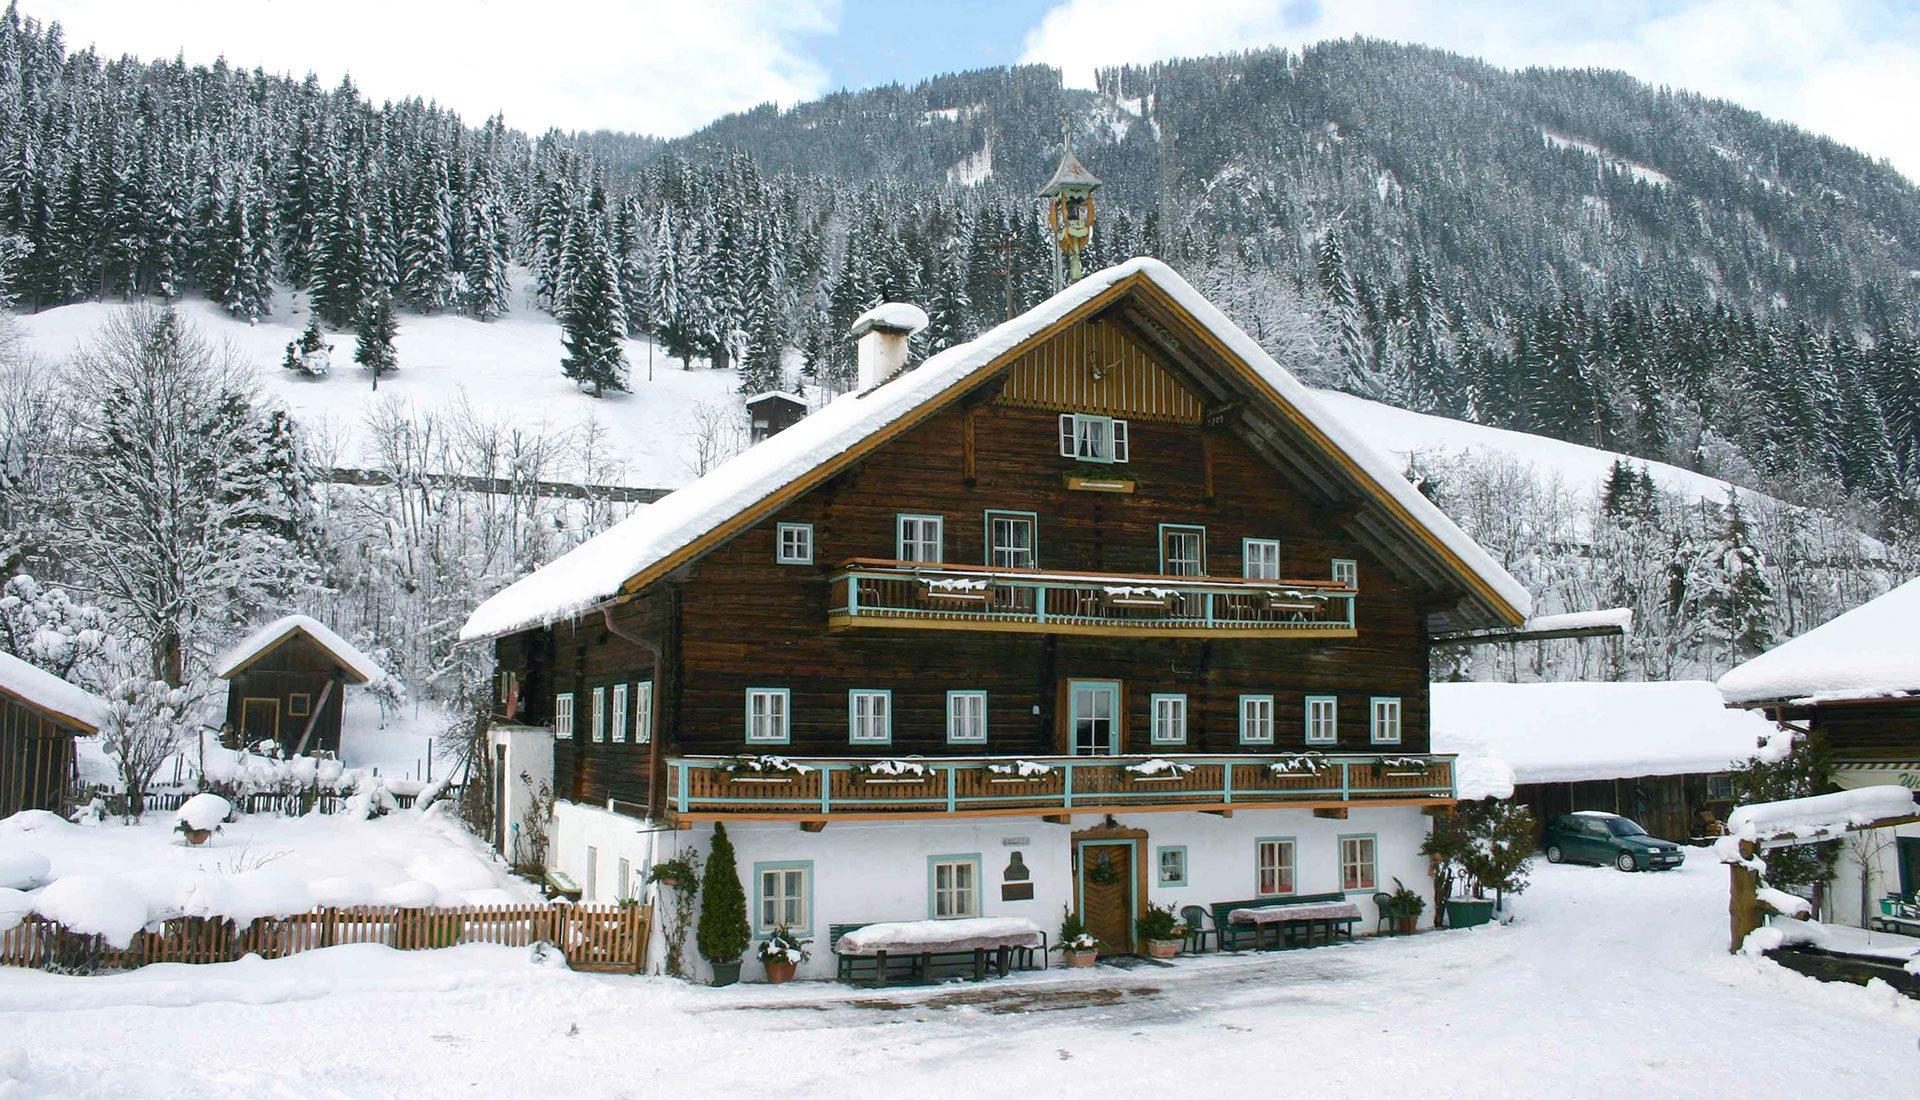 Bauernhofurlaub in Flachau, Flachauwinkl